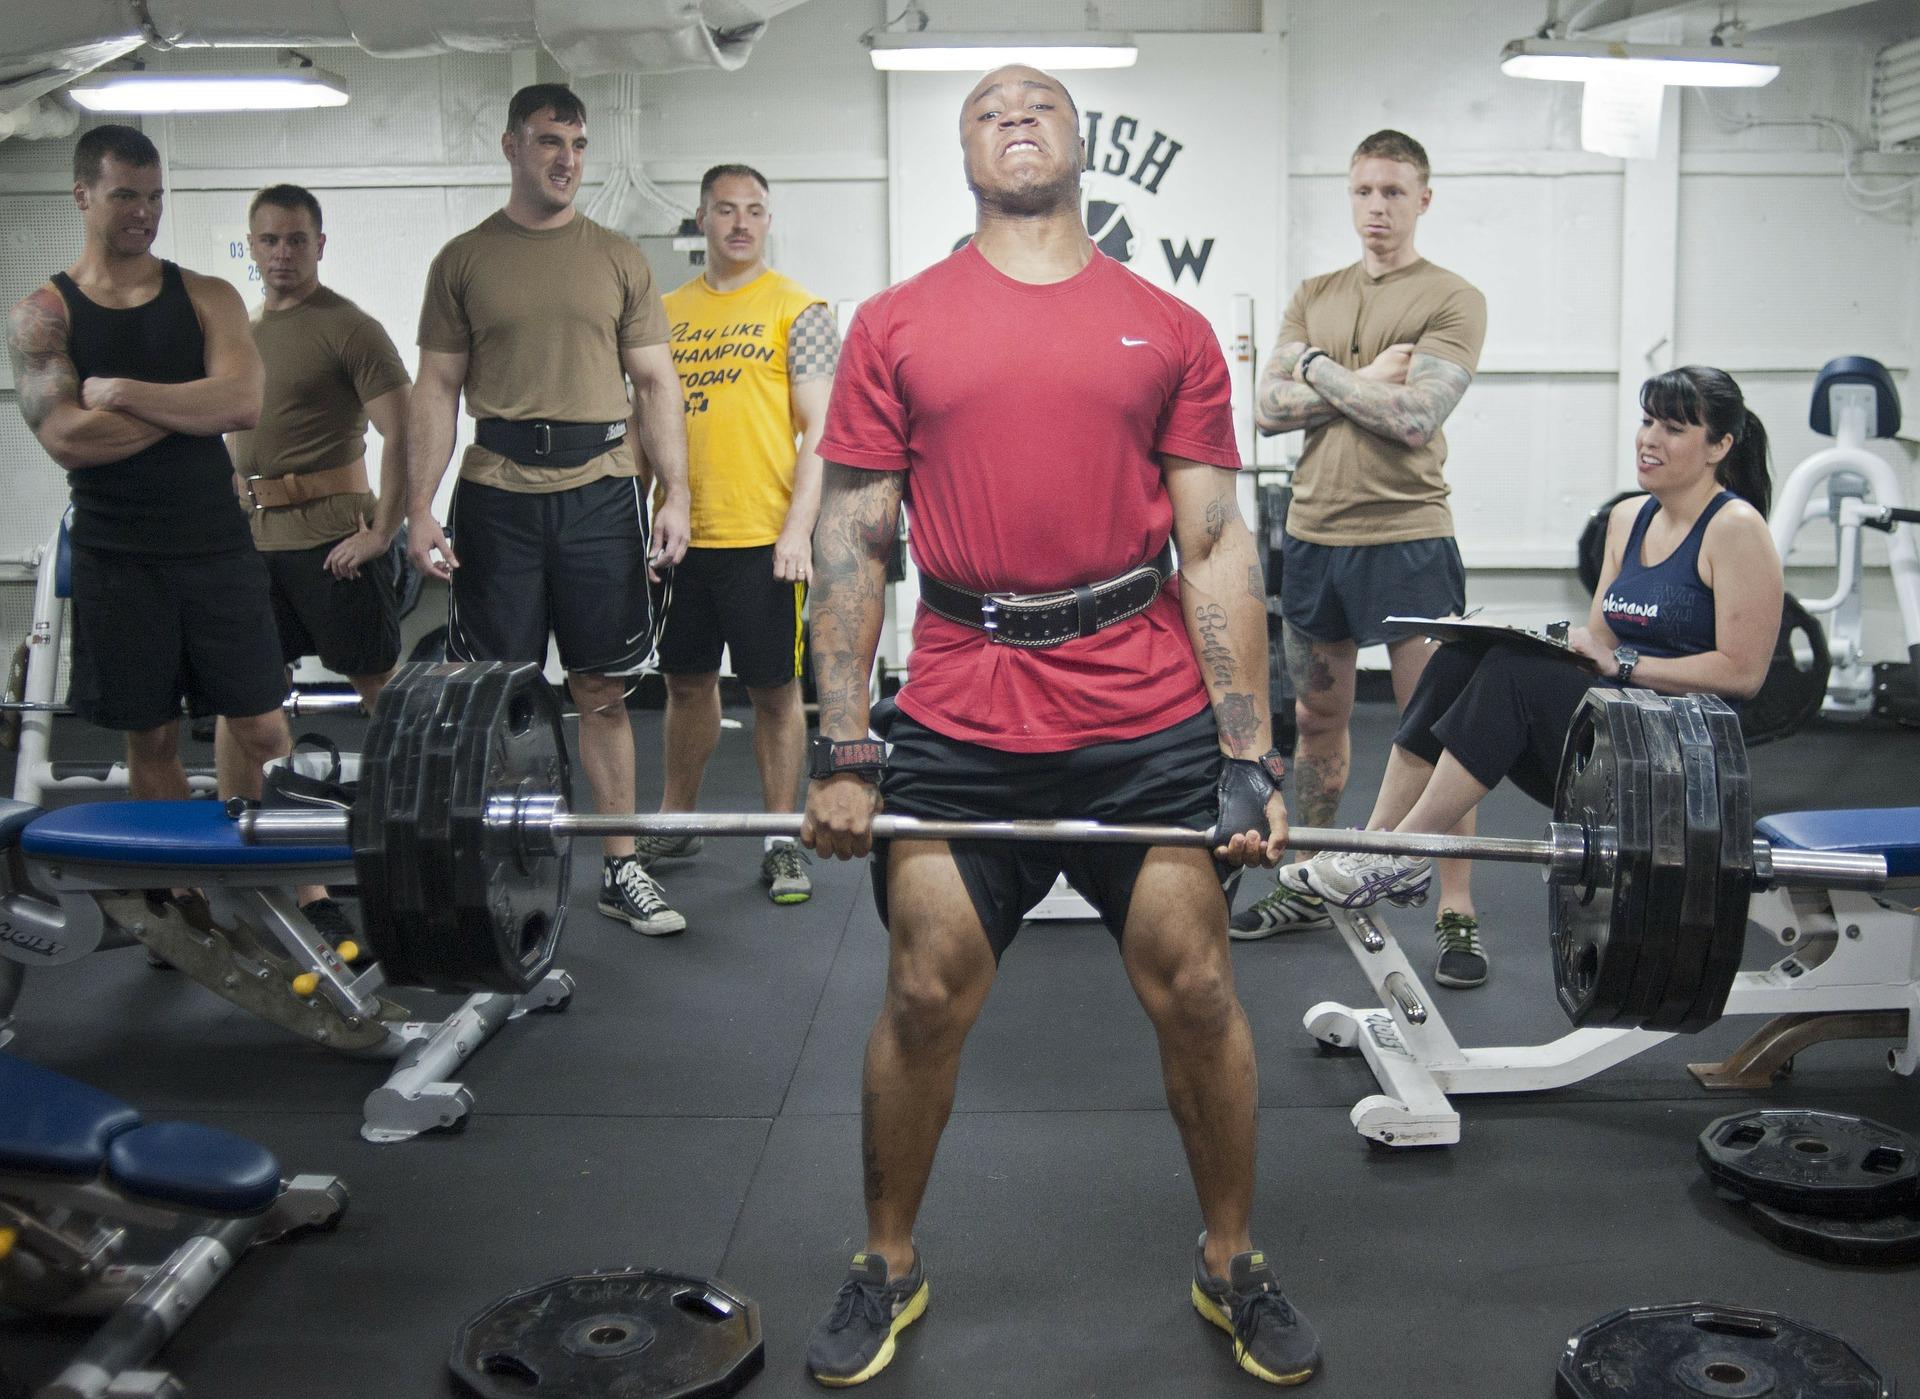 Pesistica secondo Alfonso Melis: i passi fondamentali per fare i pesi